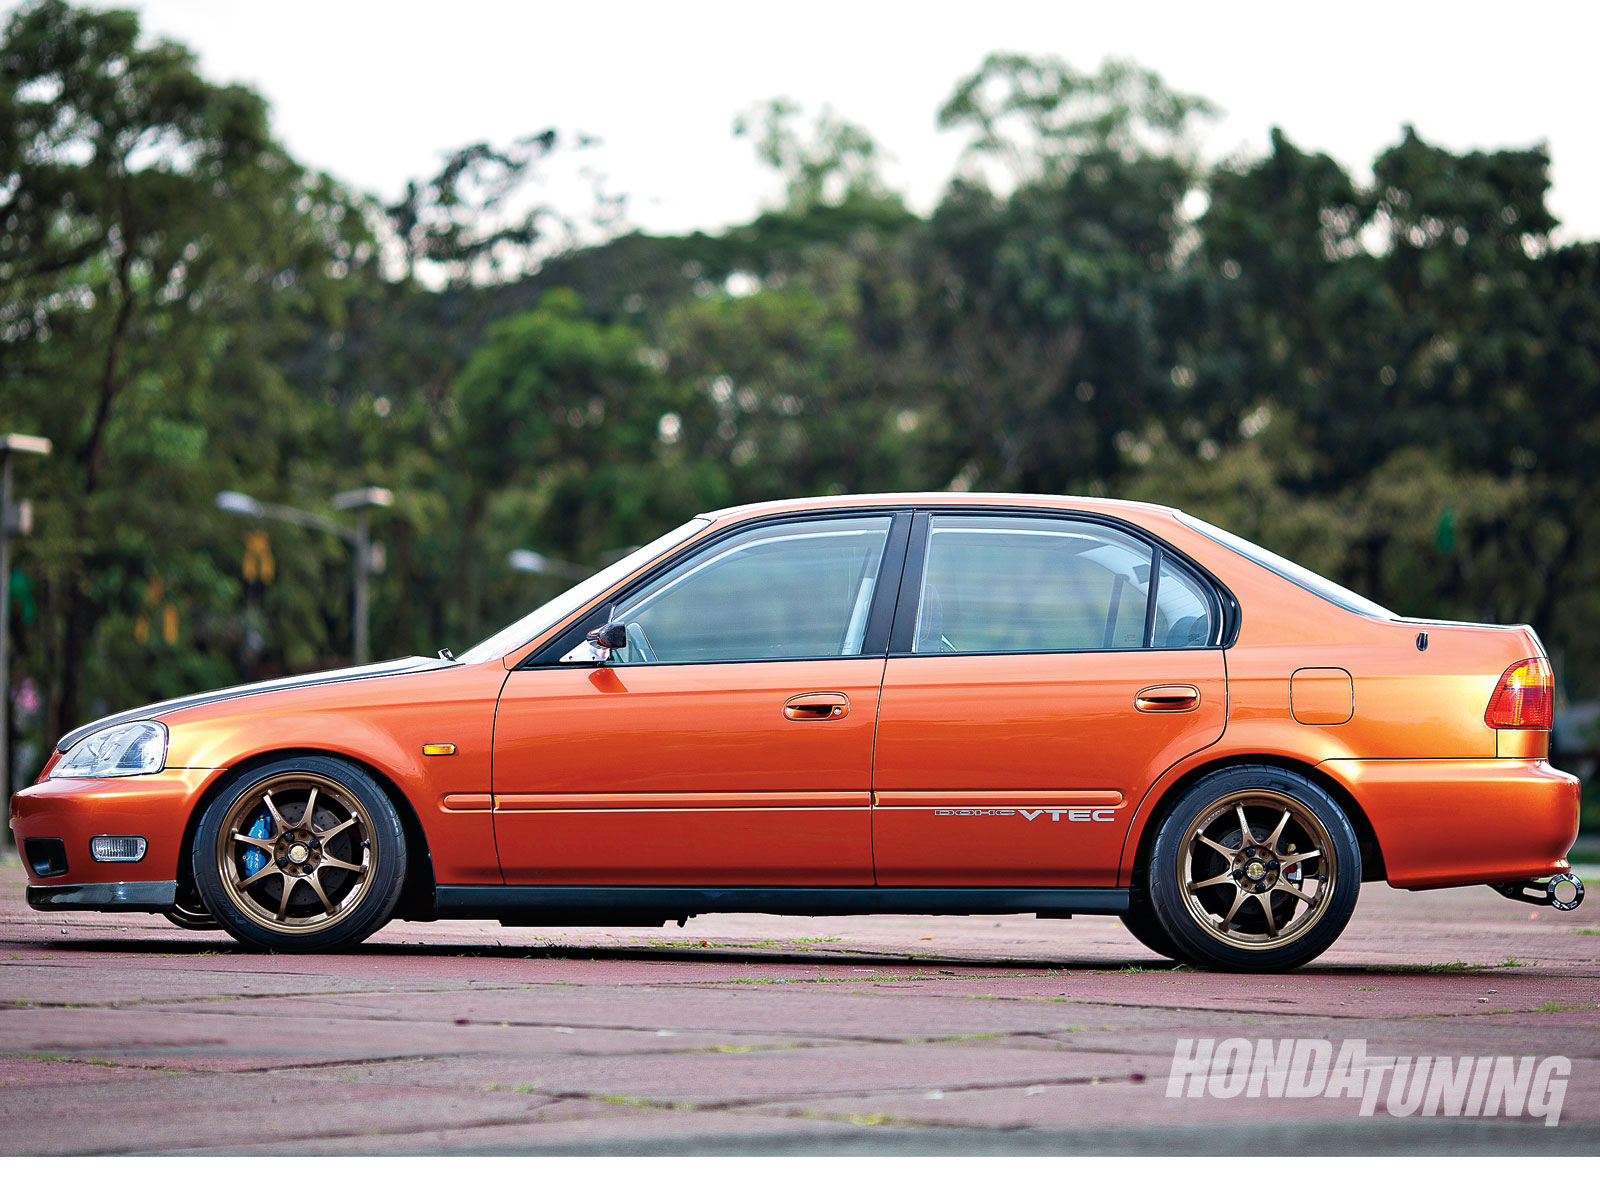 2000 Honda Civic Sir Sedan Honda Tuning Magazine